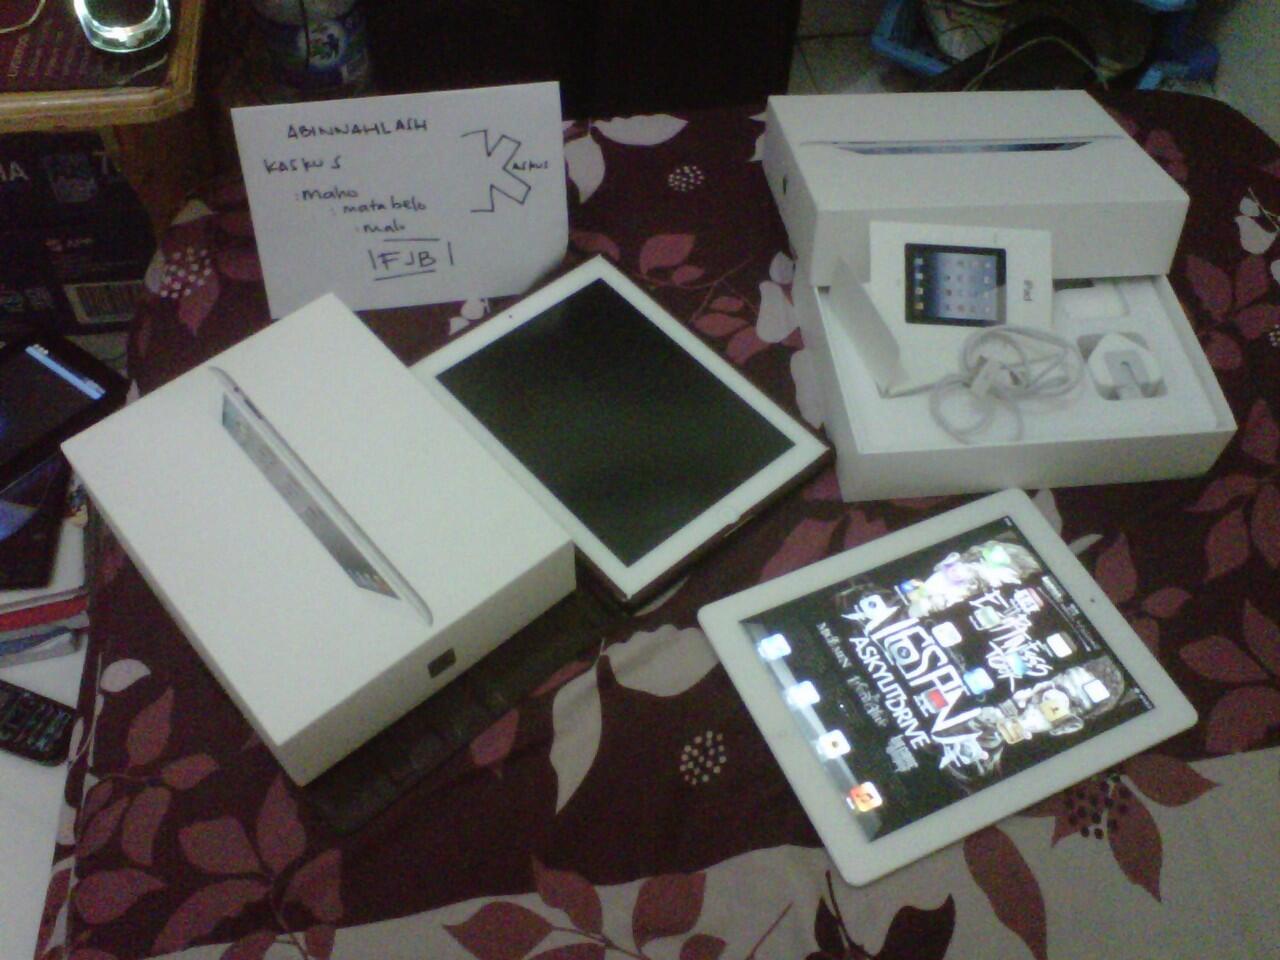 iPad2 16GB 3G+wifi Full Set, ex pemakaian cewe, pembelian agustus 2012, mulus banget